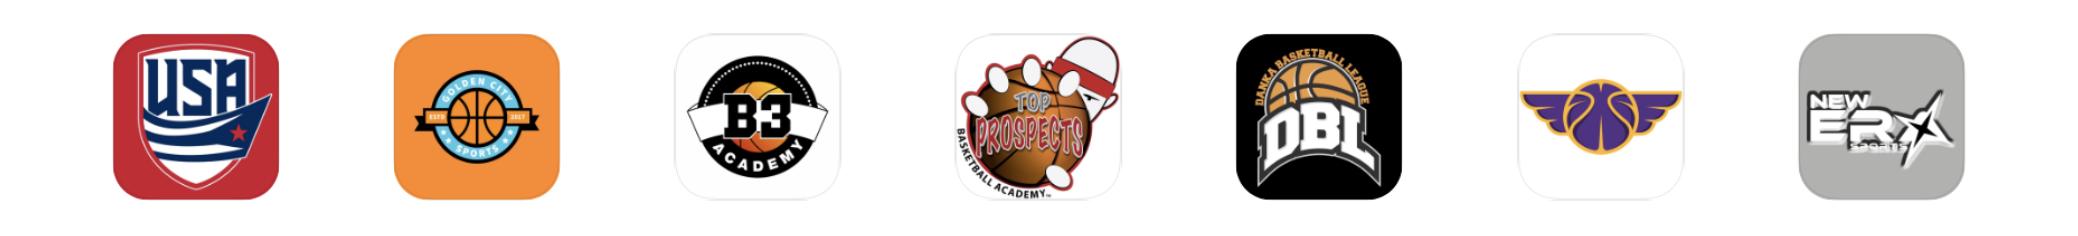 Wooter Custom Apps & Website